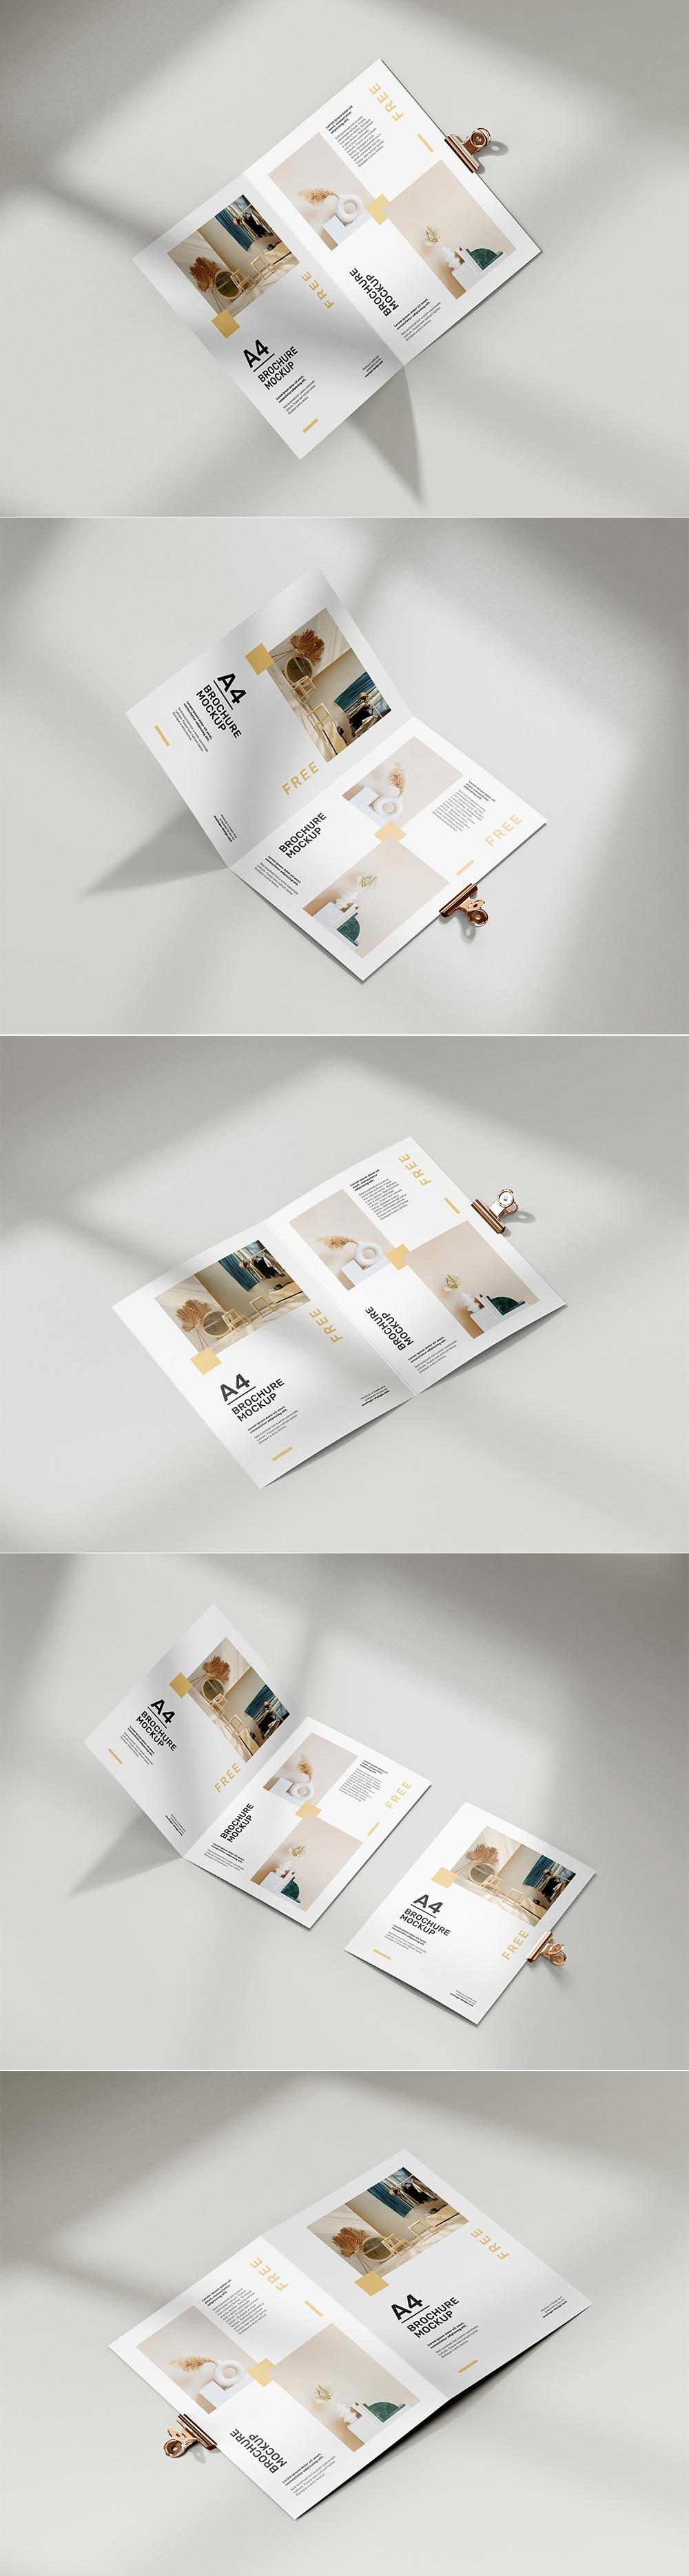 Free Folded A4 Brochure Mockups